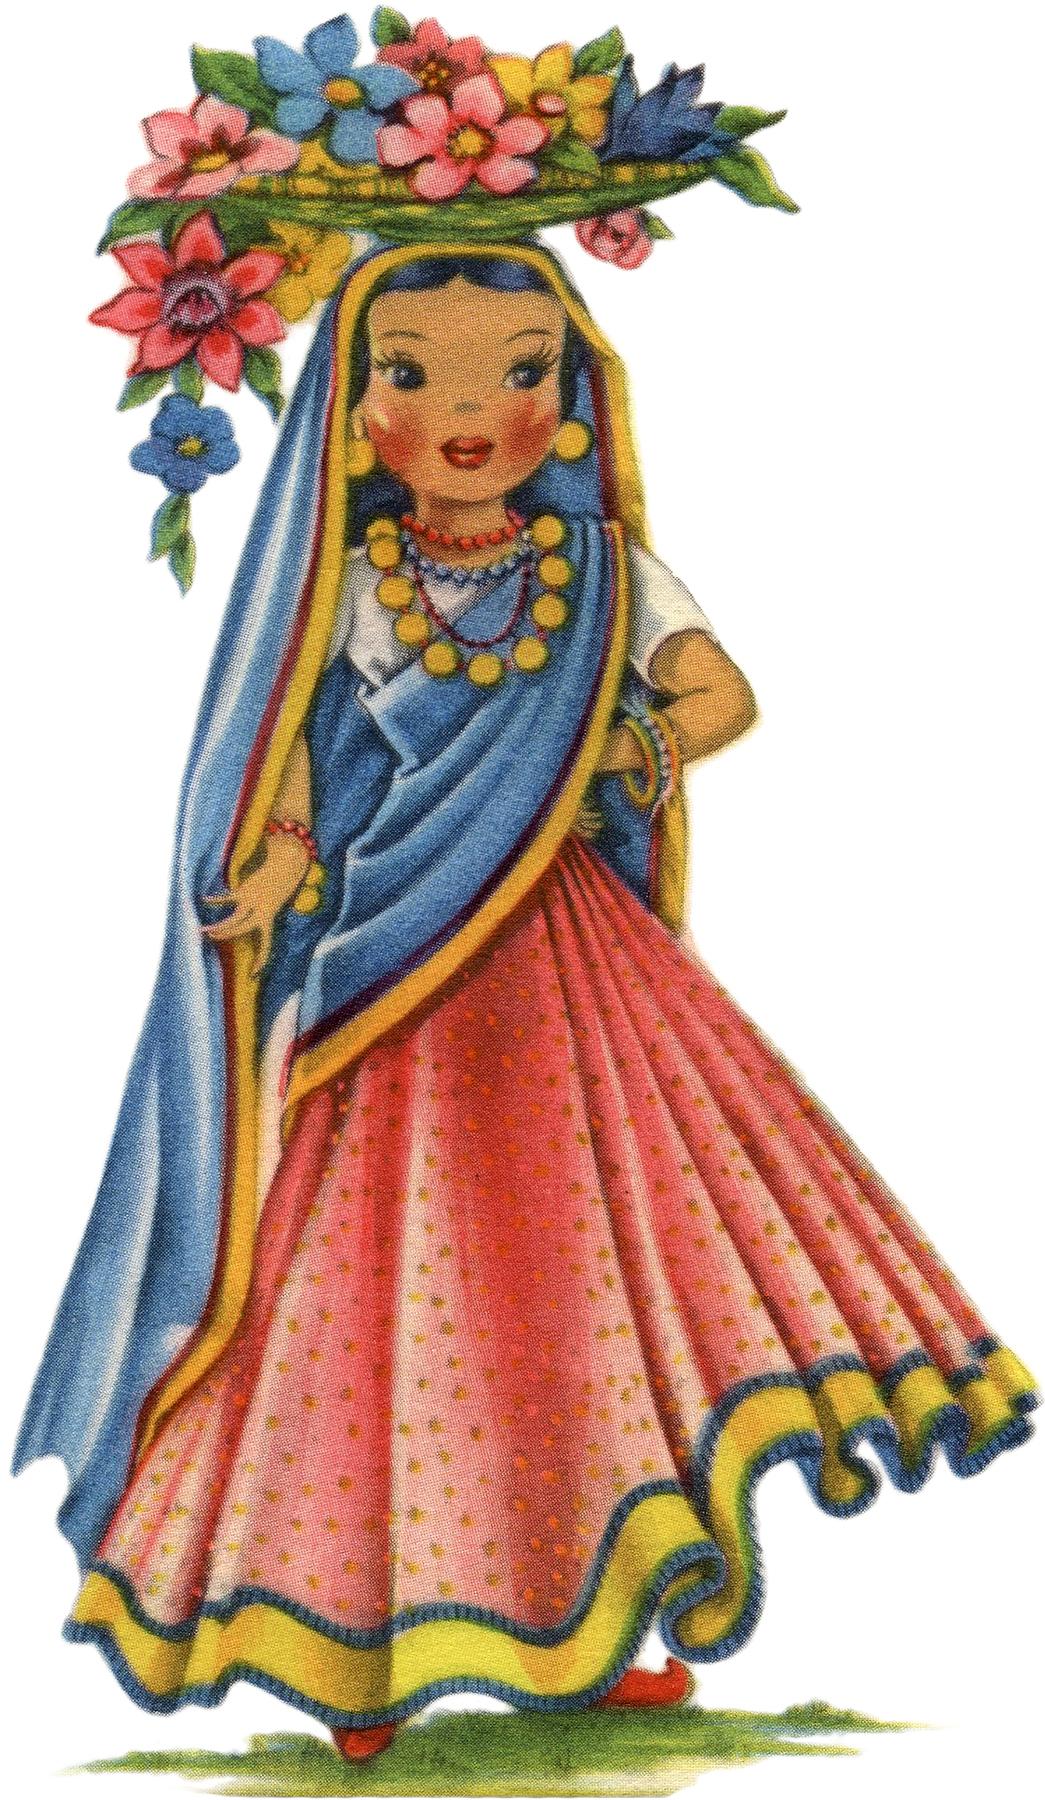 Retro India Doll Image The Graphics Fairy